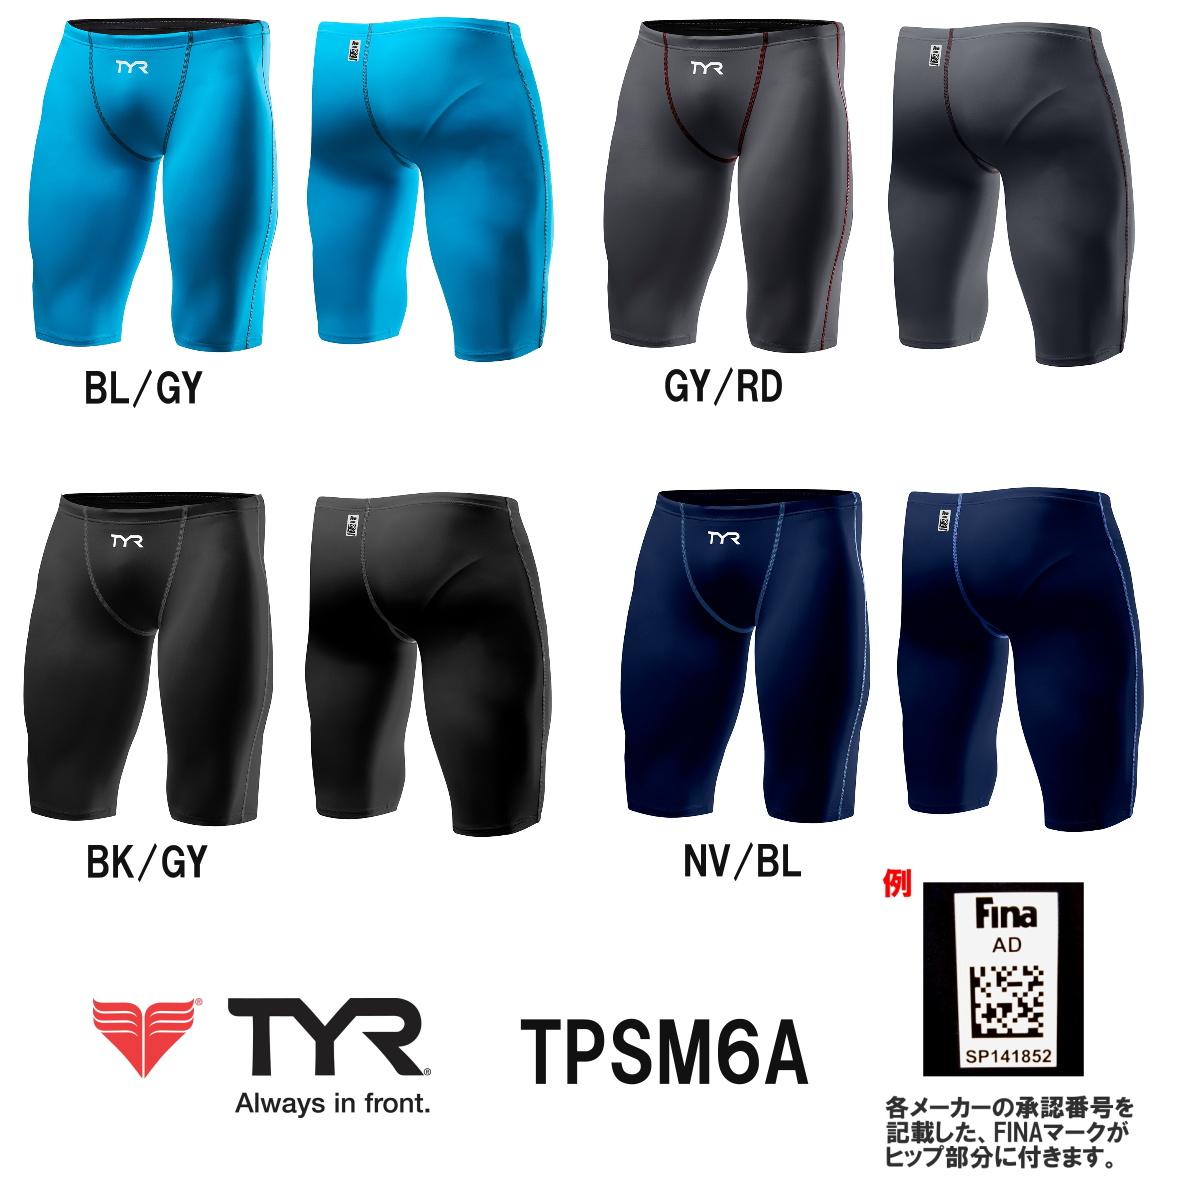 TYR ティア 競泳水着 メンズ THRESHER MEN'S JAMMER スレッシャー メンズ ジャマー fina承認 TPSM6A